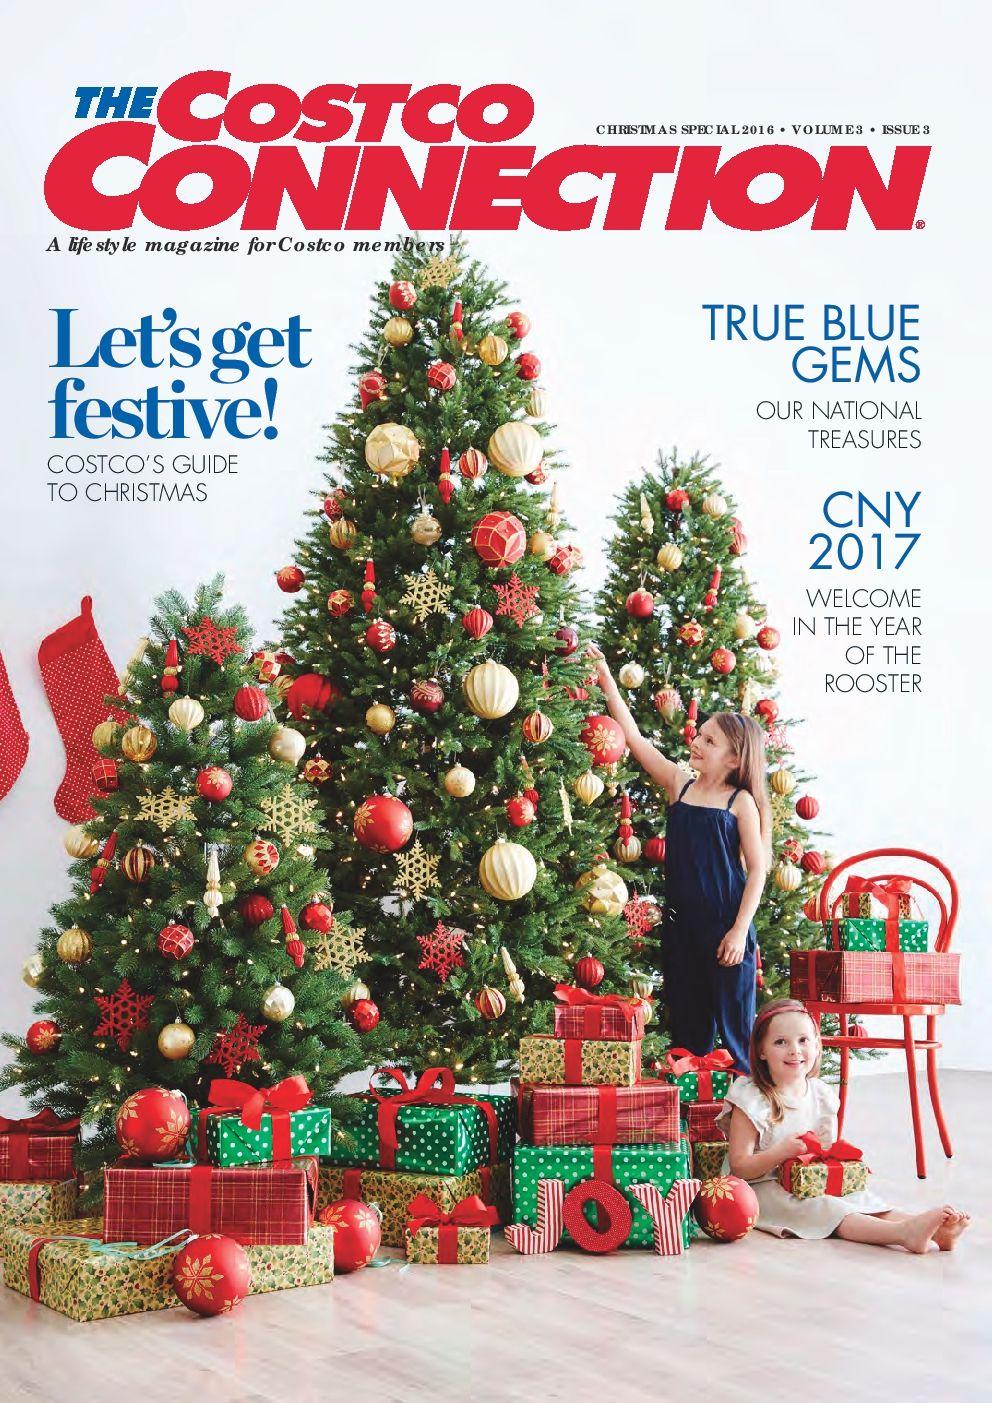 costco magazine christmas special 2016 httpolcataloguecomcostco costco magazinehtml